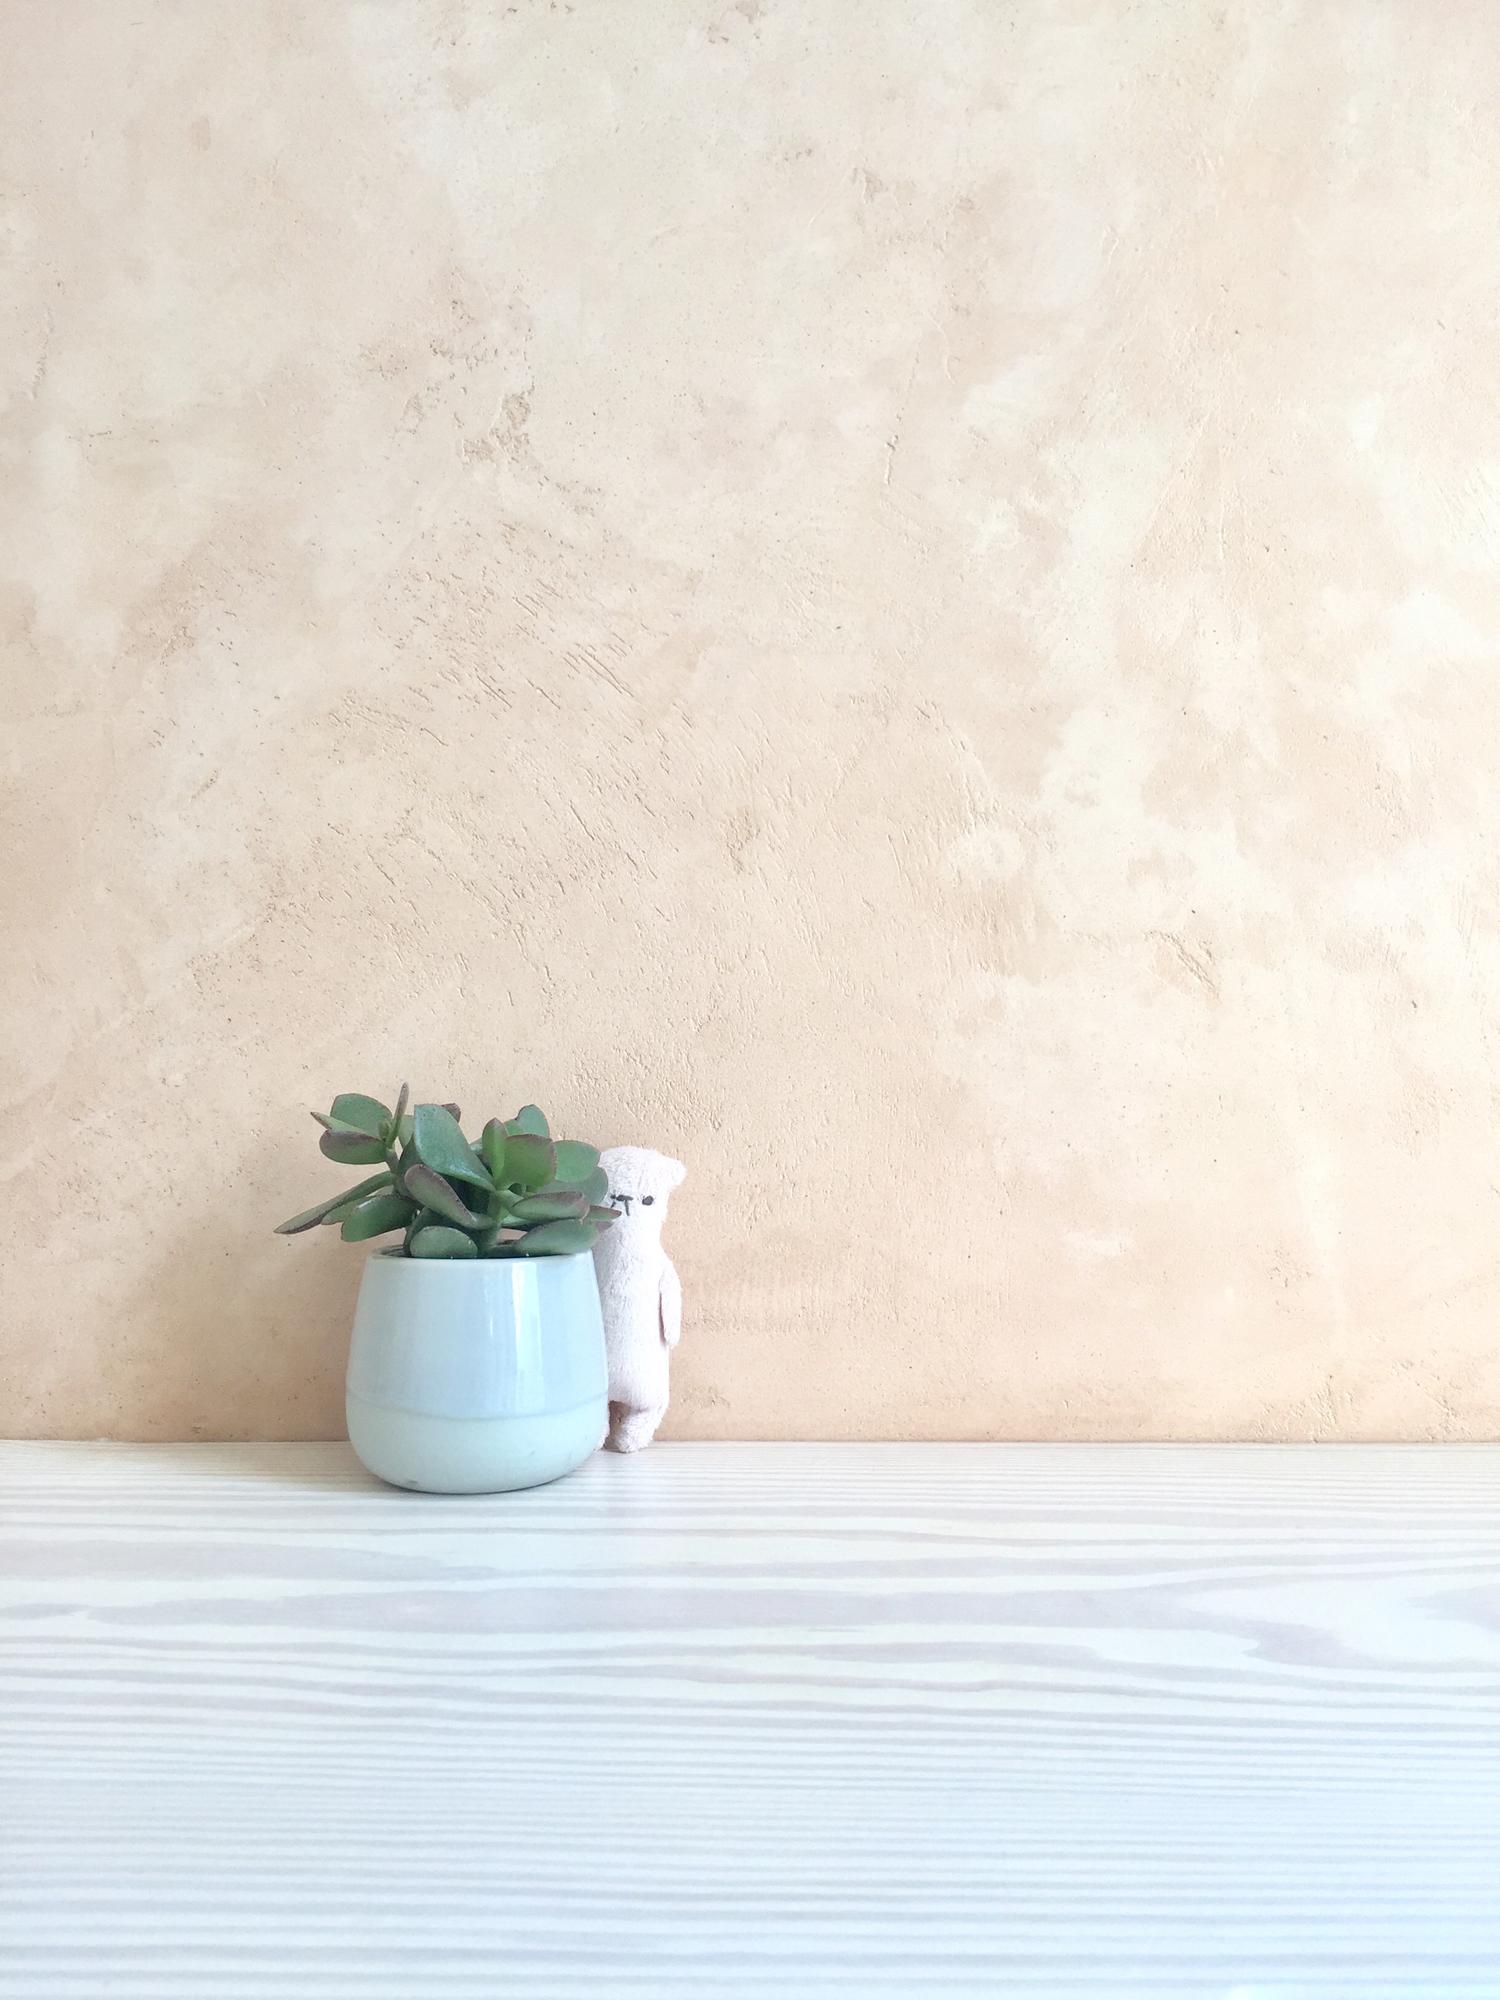 espanyolet_patina_wall_pigmented_microcement_IMG_6562.jpg